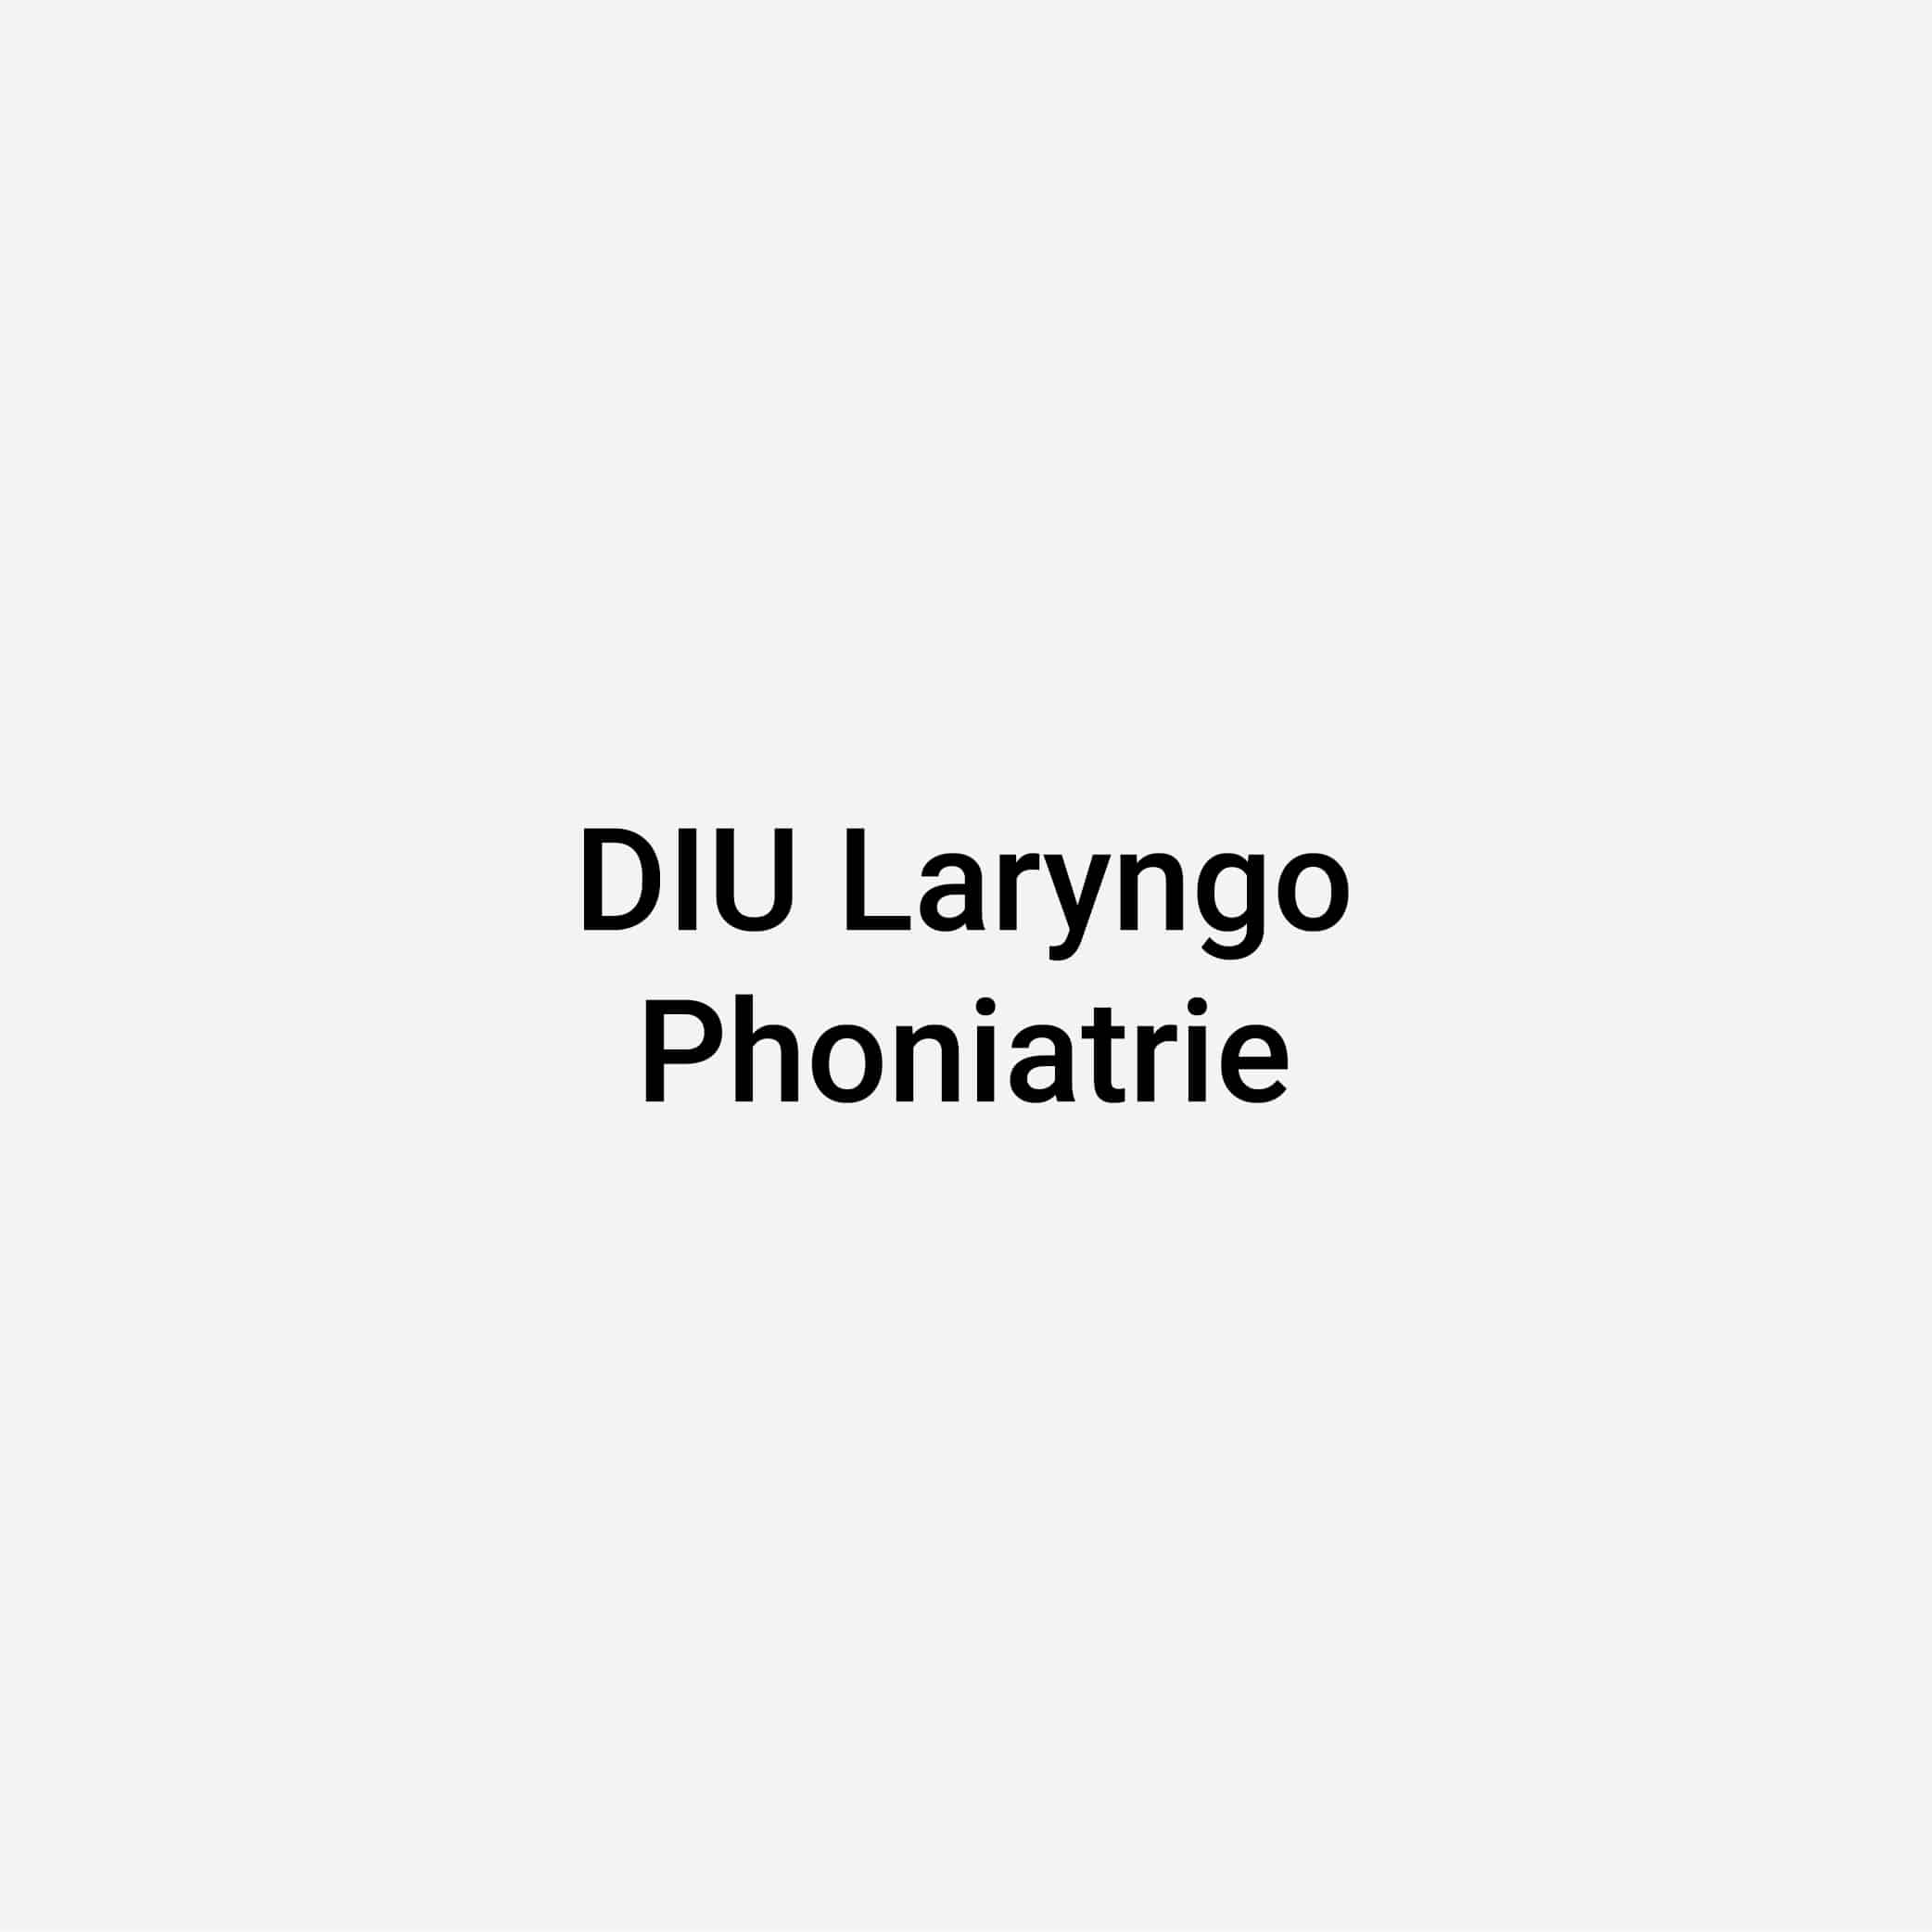 DIU Laryngo Phoniatrie